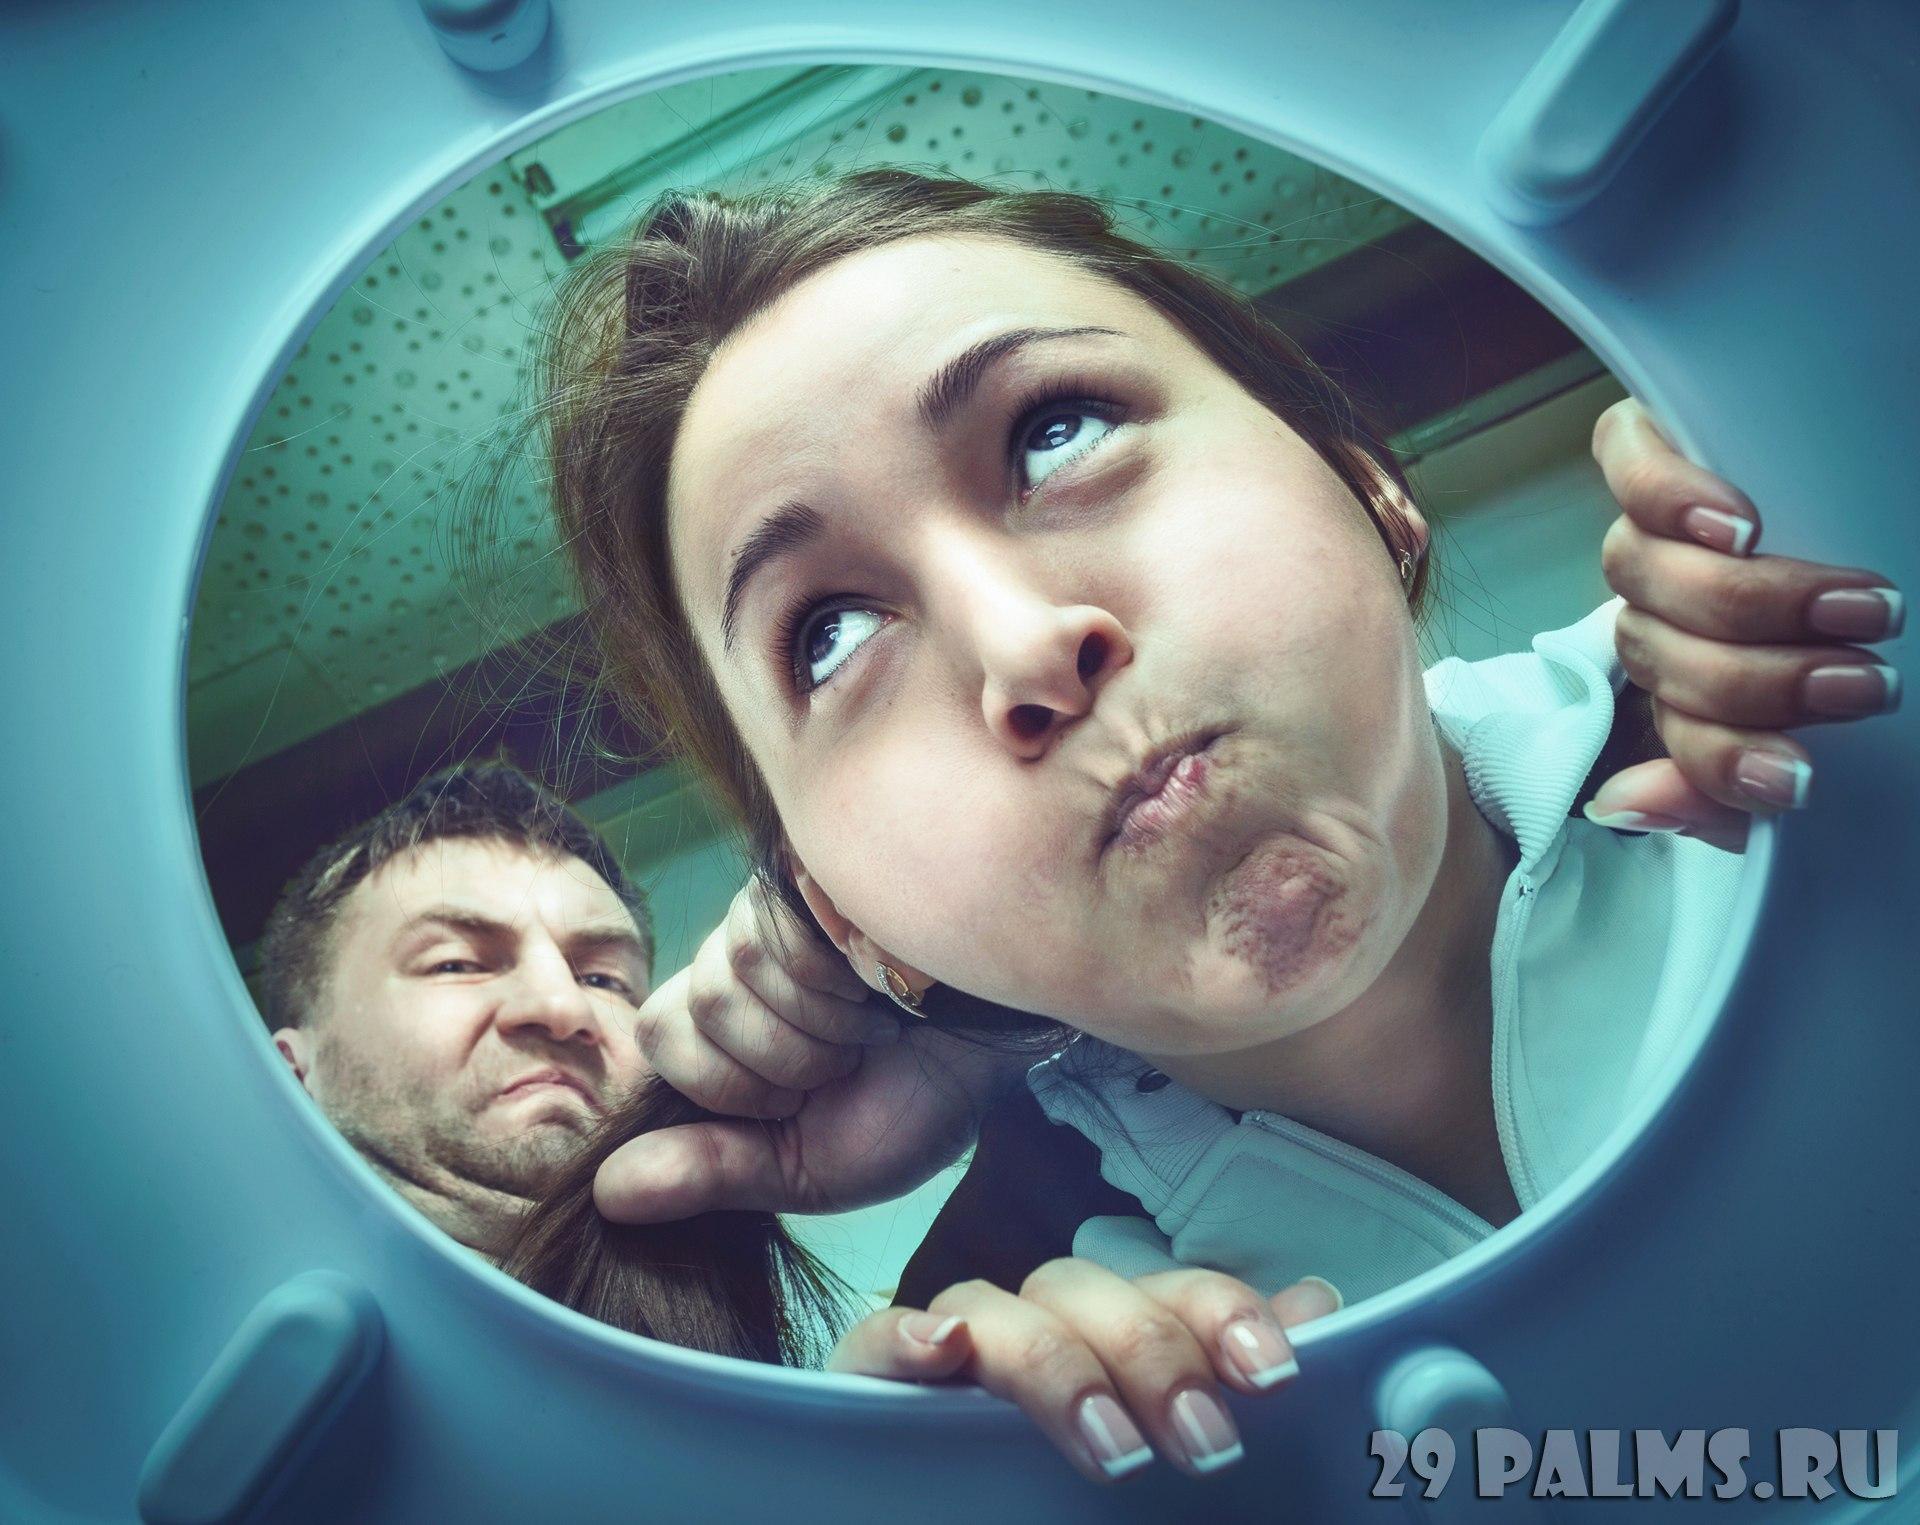 ХХХ Видео Моя жена любит негров  RuDojkicom